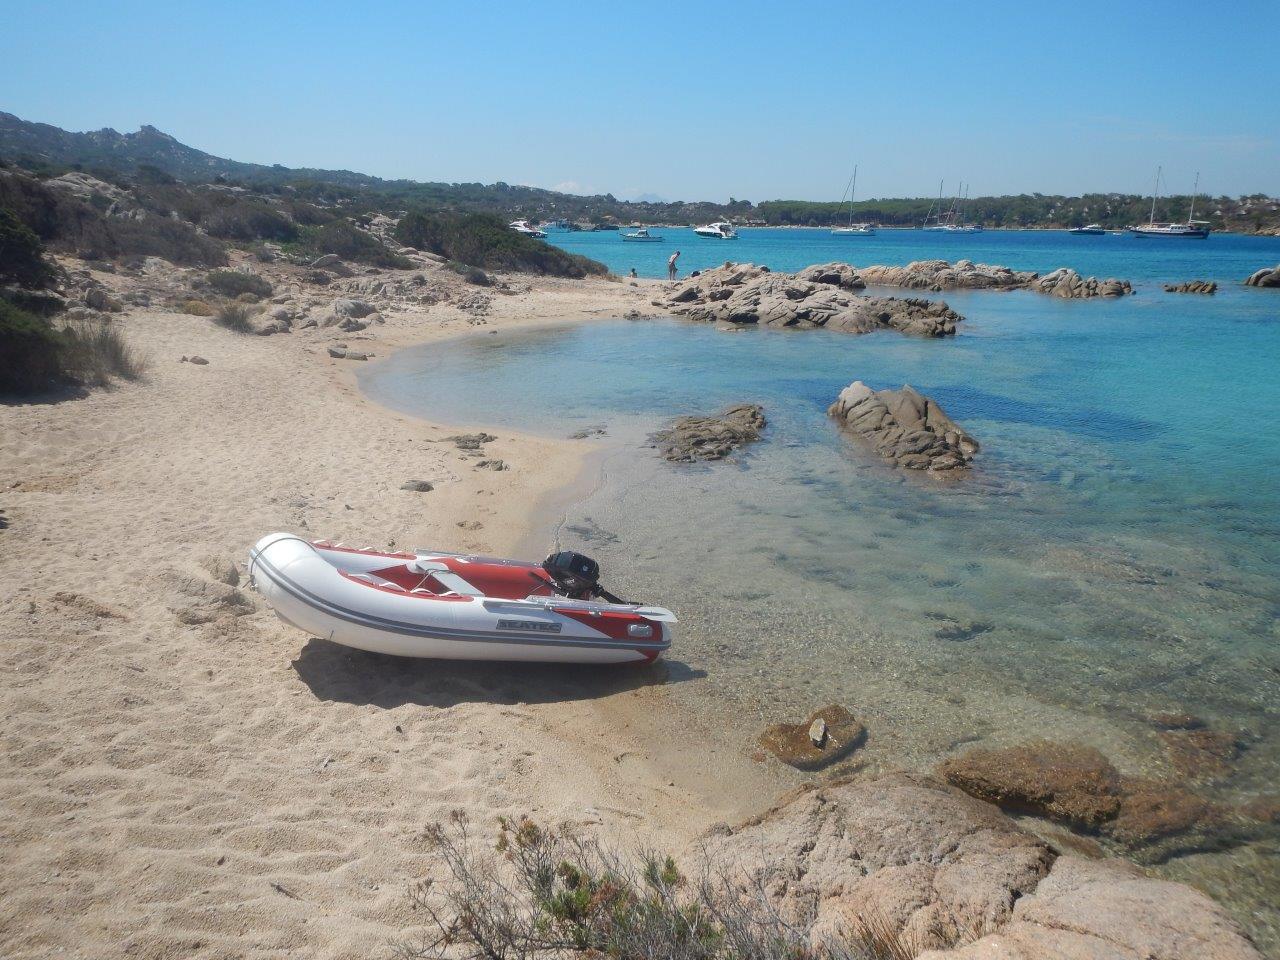 Segeltörn zu der Insel Capreira im Maddalena Archipel